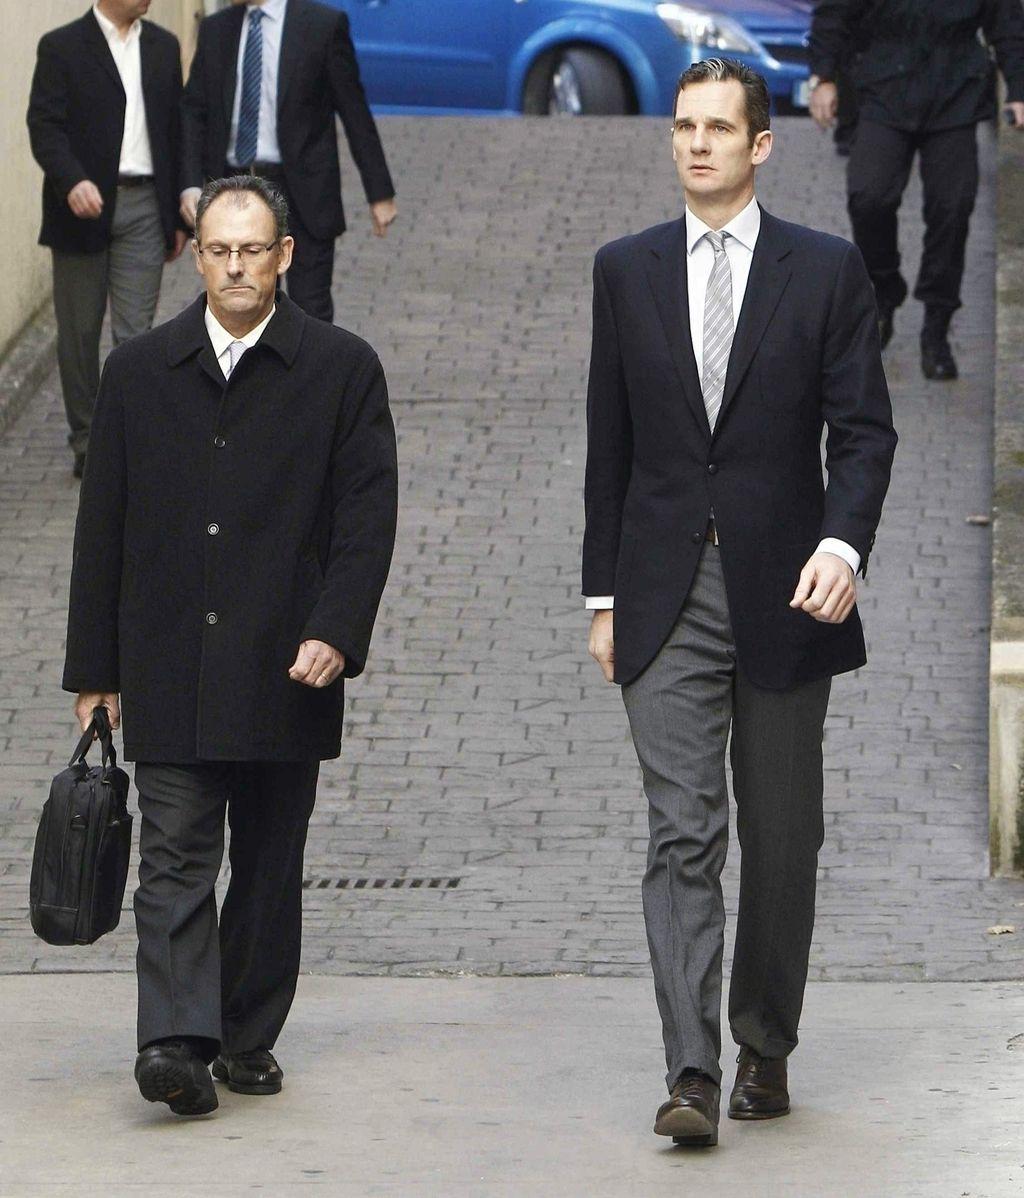 Urdangarin llega juzgados de Palma. Foto:EFE